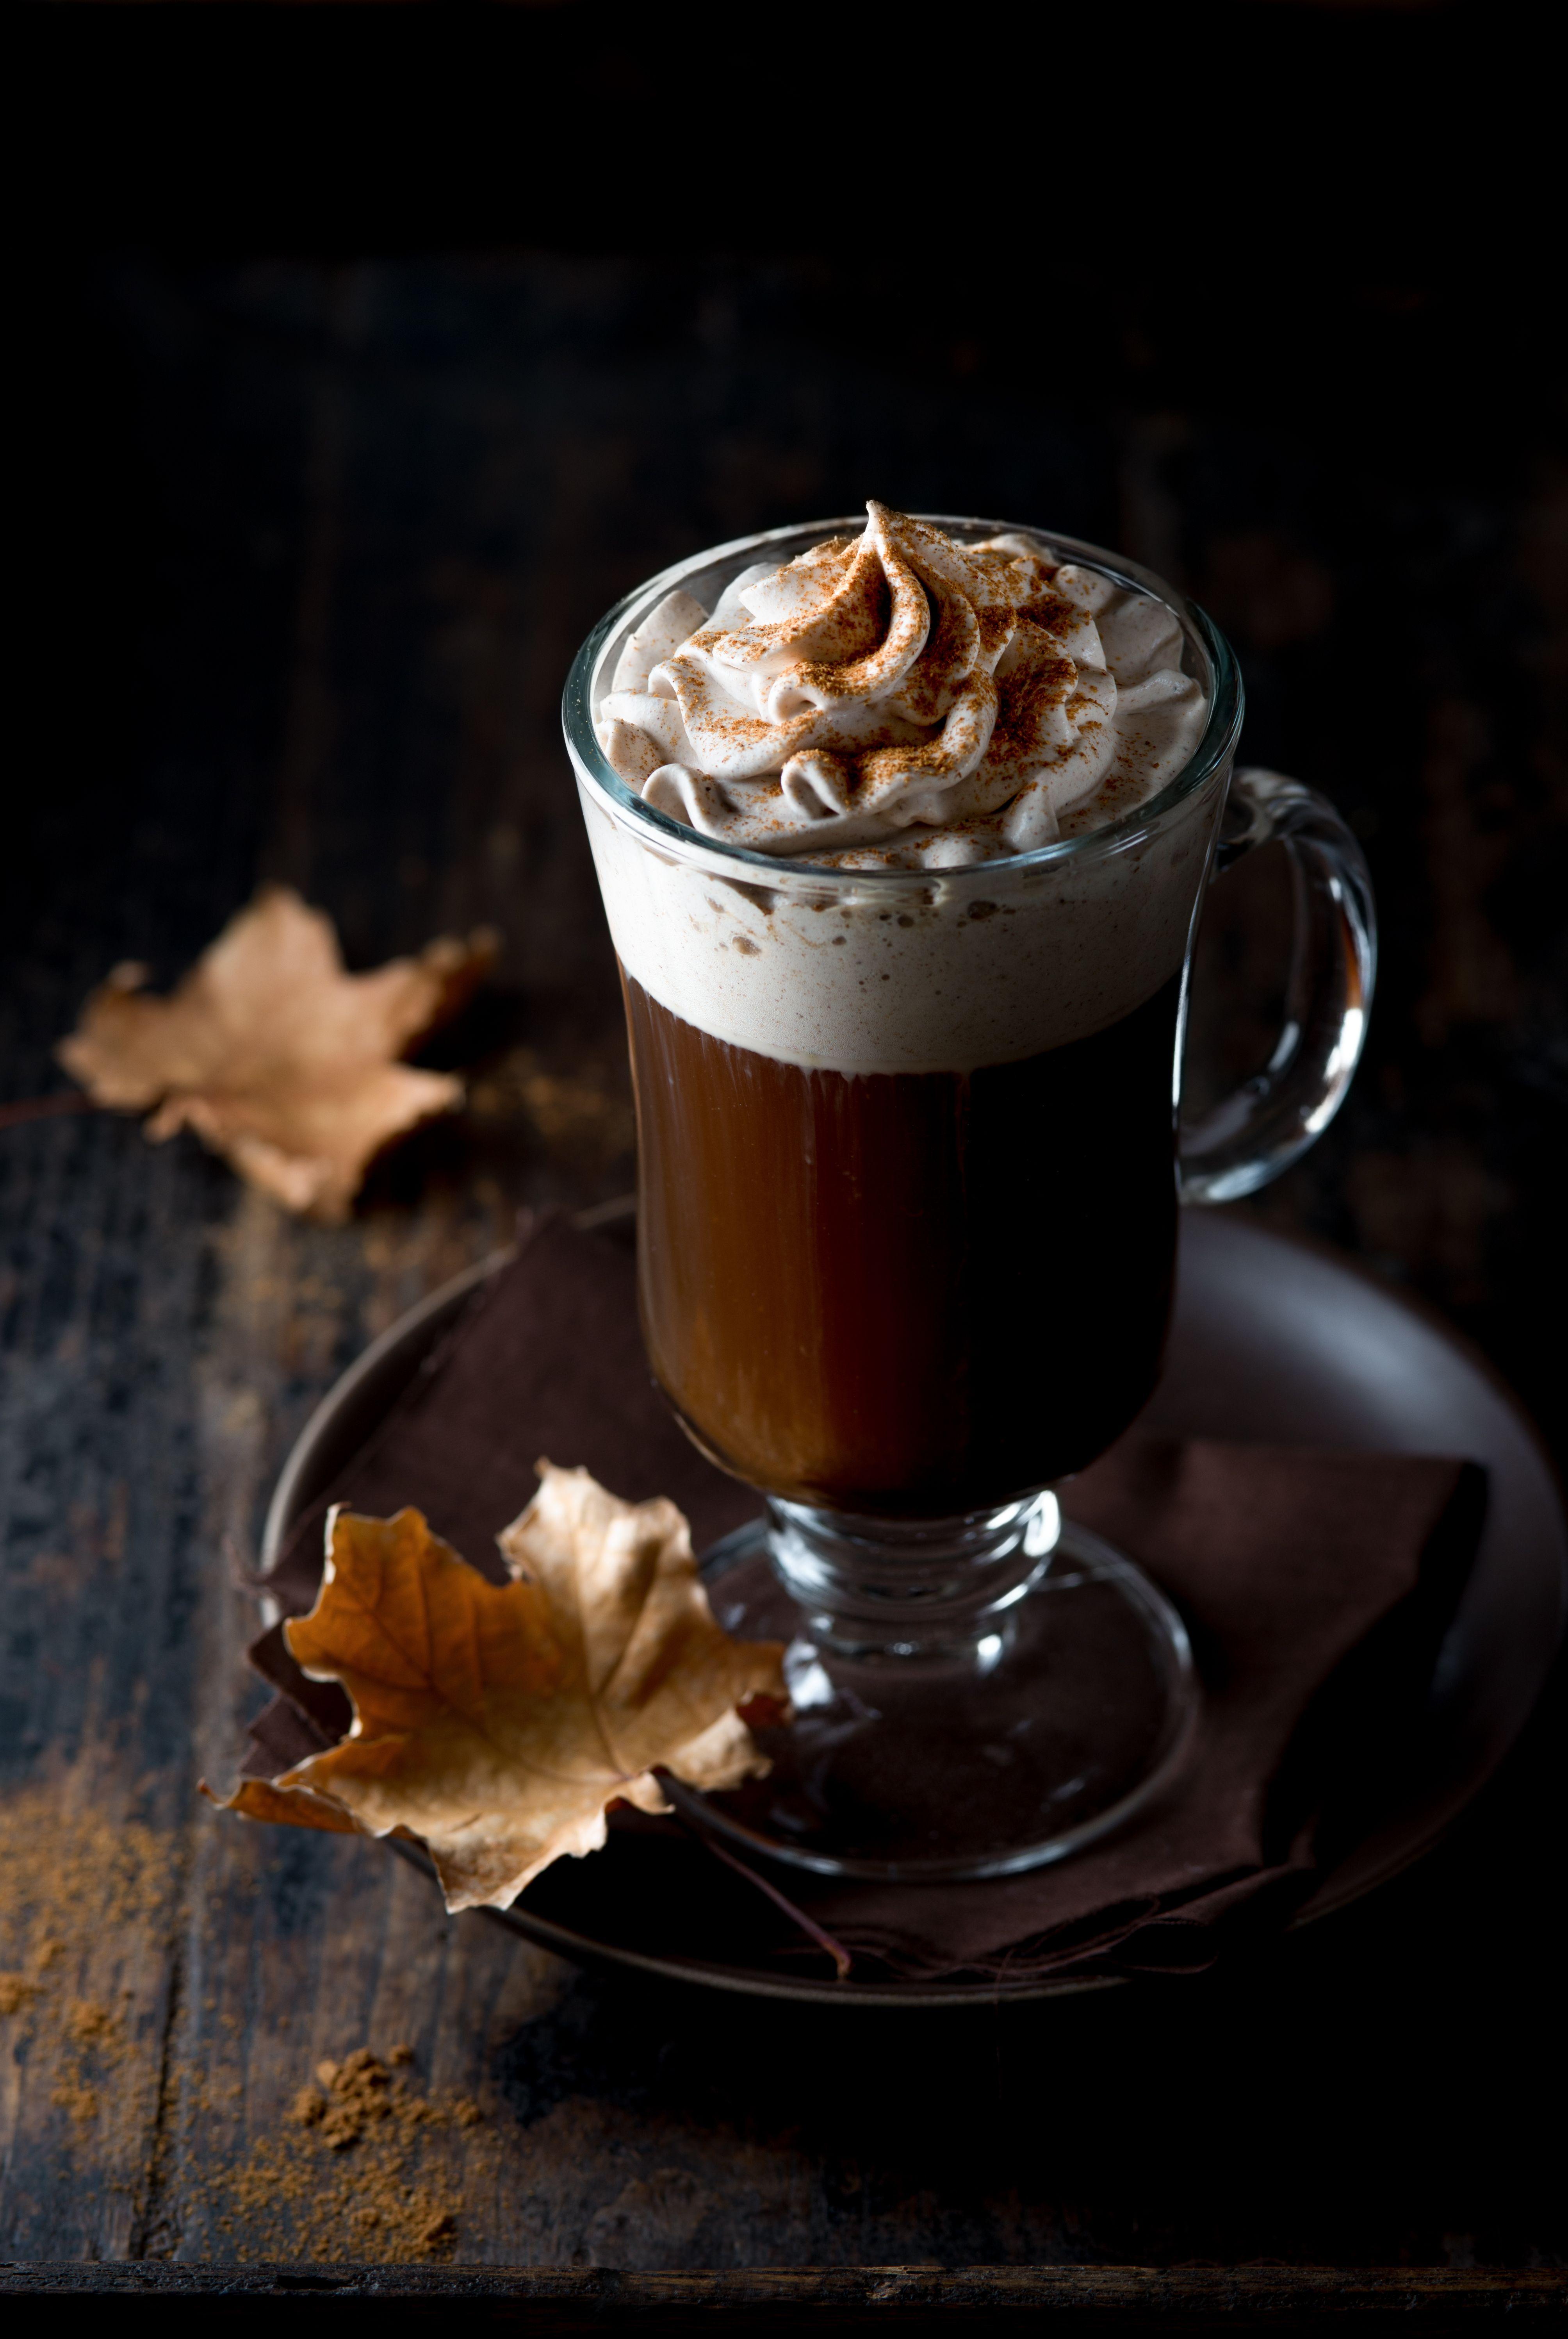 9 Irish Coffee Drinks Youve Gotta Try This St. Patricks Day